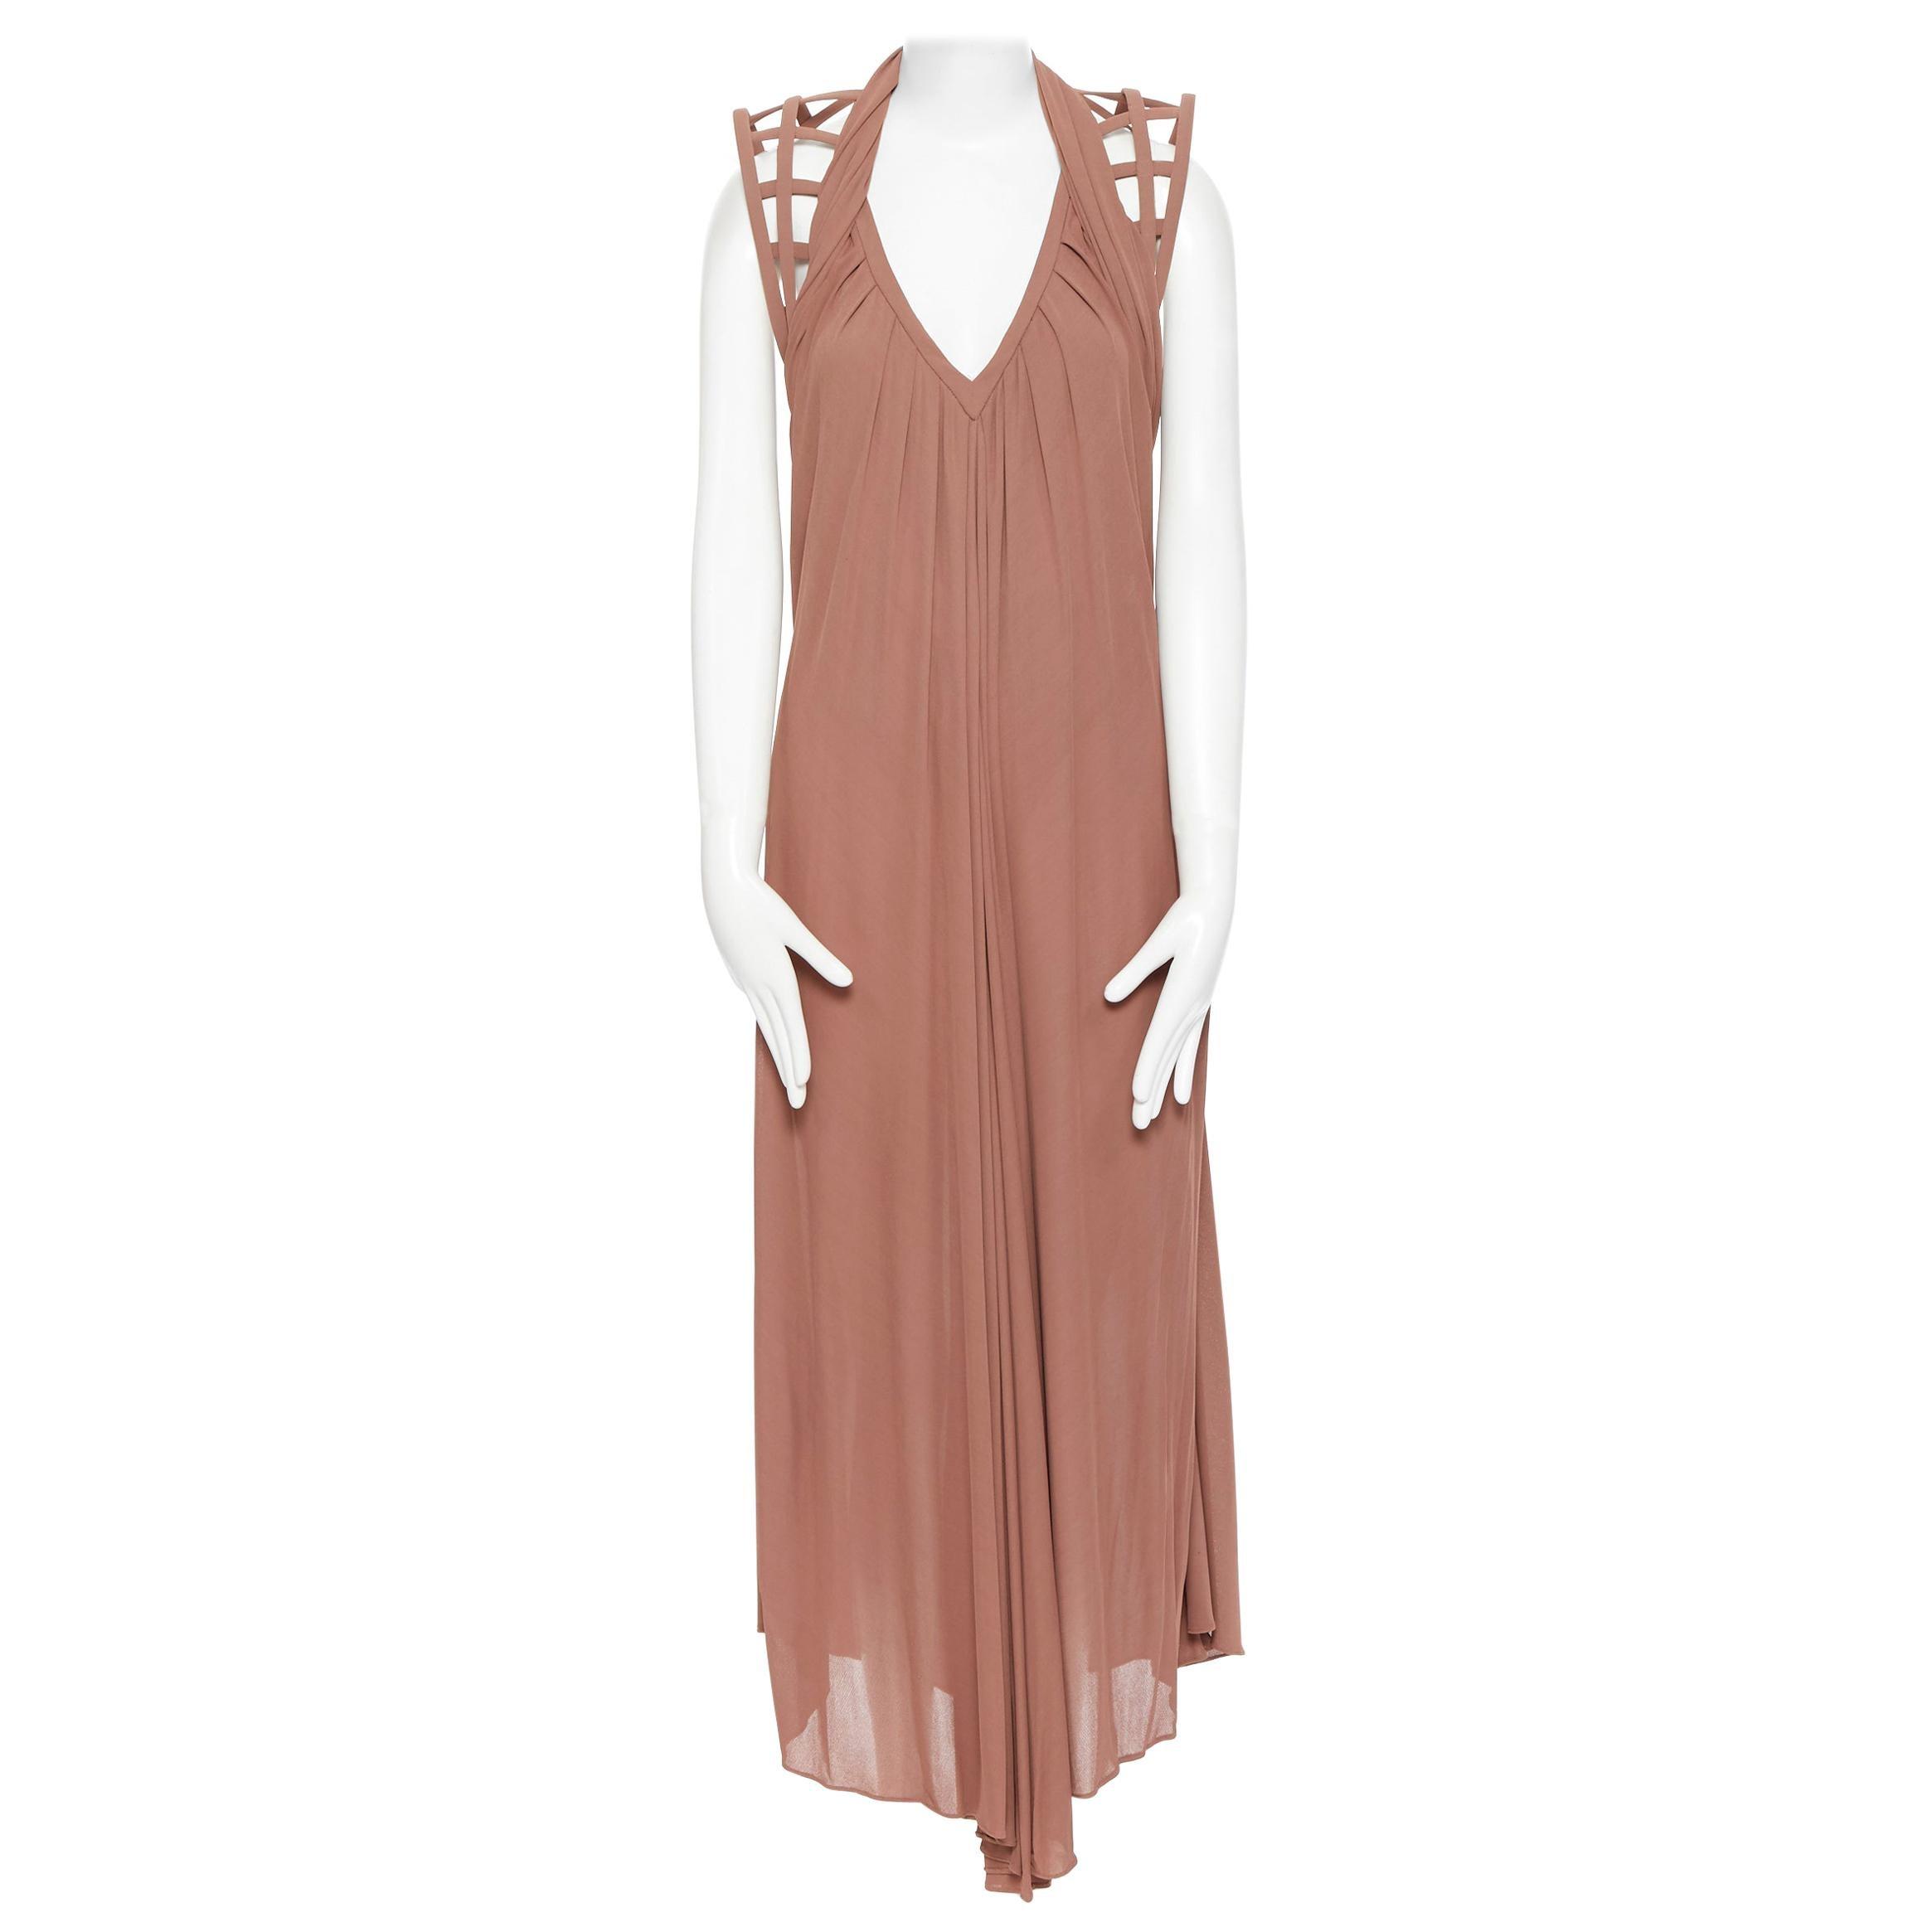 JEAN PAUL GAULTIER nude beige caged structured shoulder draped midi dress